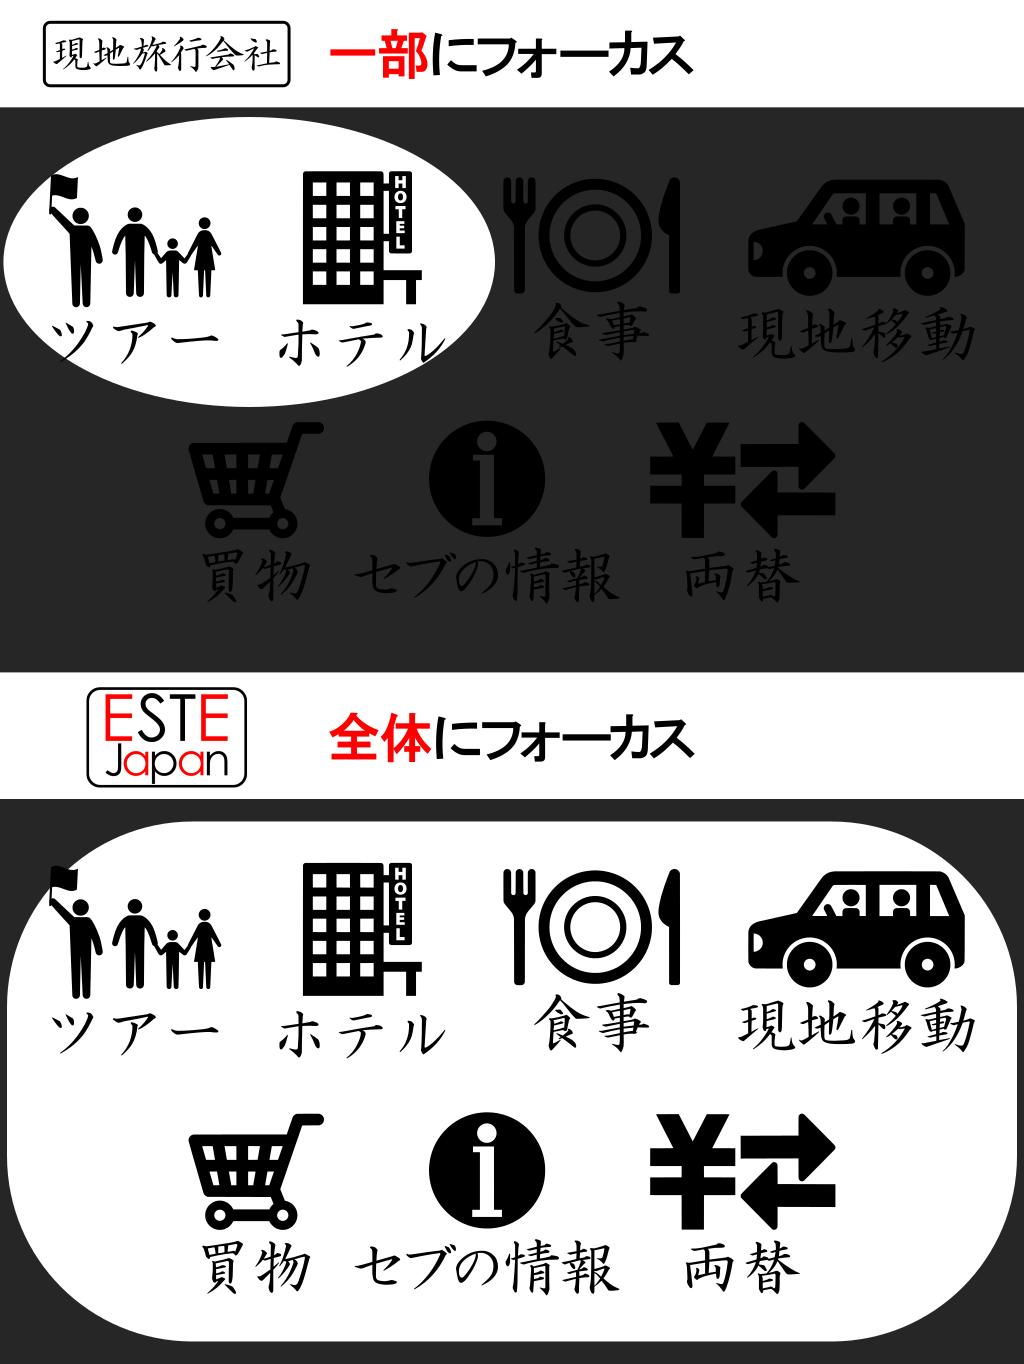 ESTE Japanと現地旅行会社の違いの分かる画像